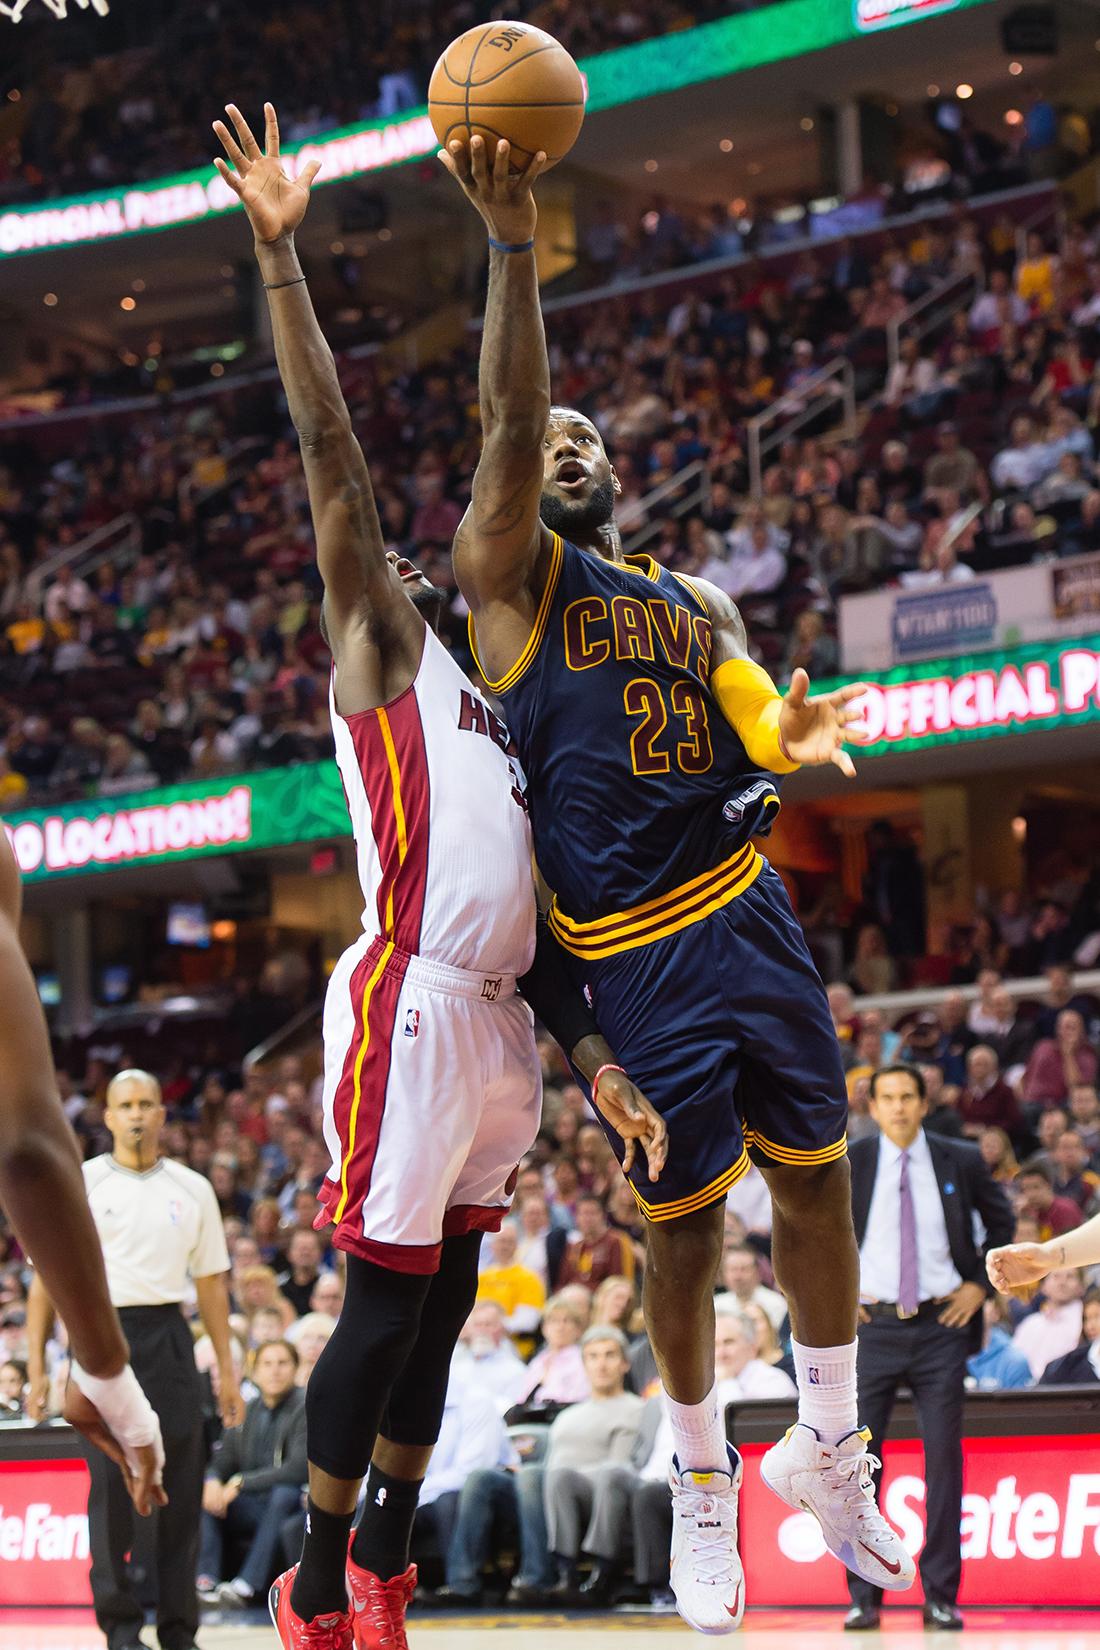 LeBron James ingresa al top 20 por viva basquet